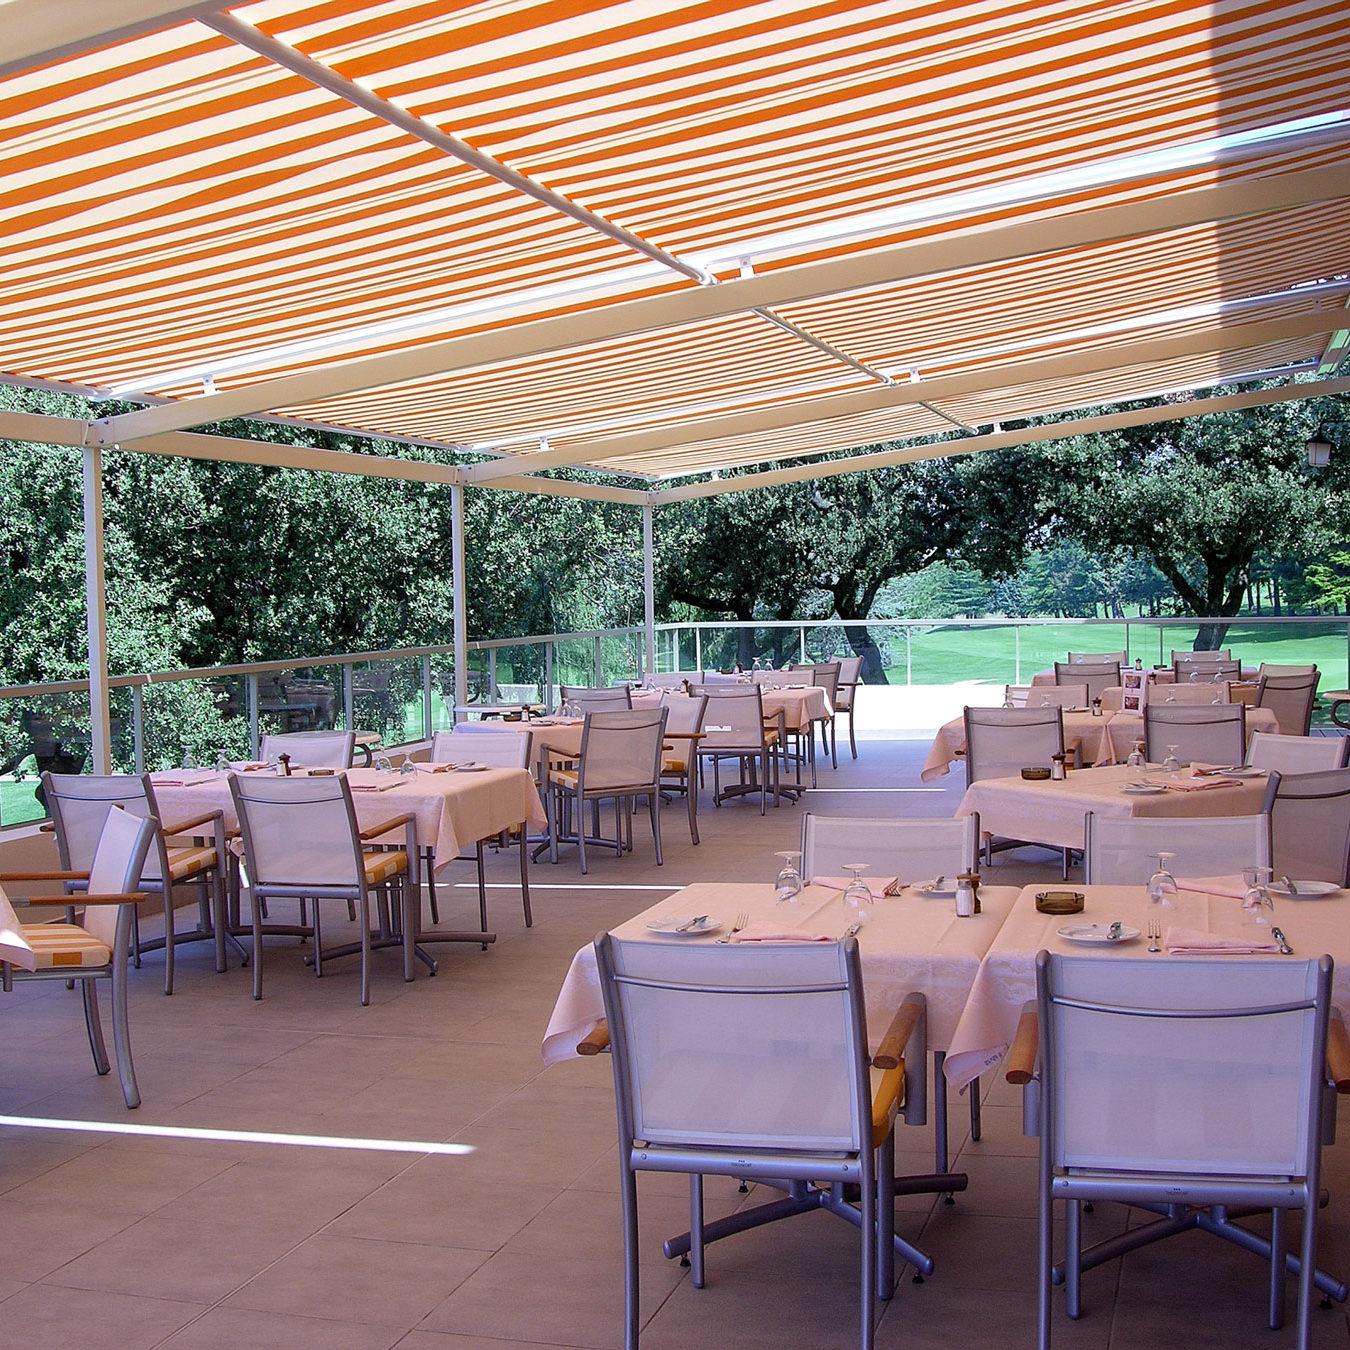 Golf-Monte-carlo-Monaco-club-house-18-trous-parcours-green-practice-sport-loisirs-cote-azur-mer-7